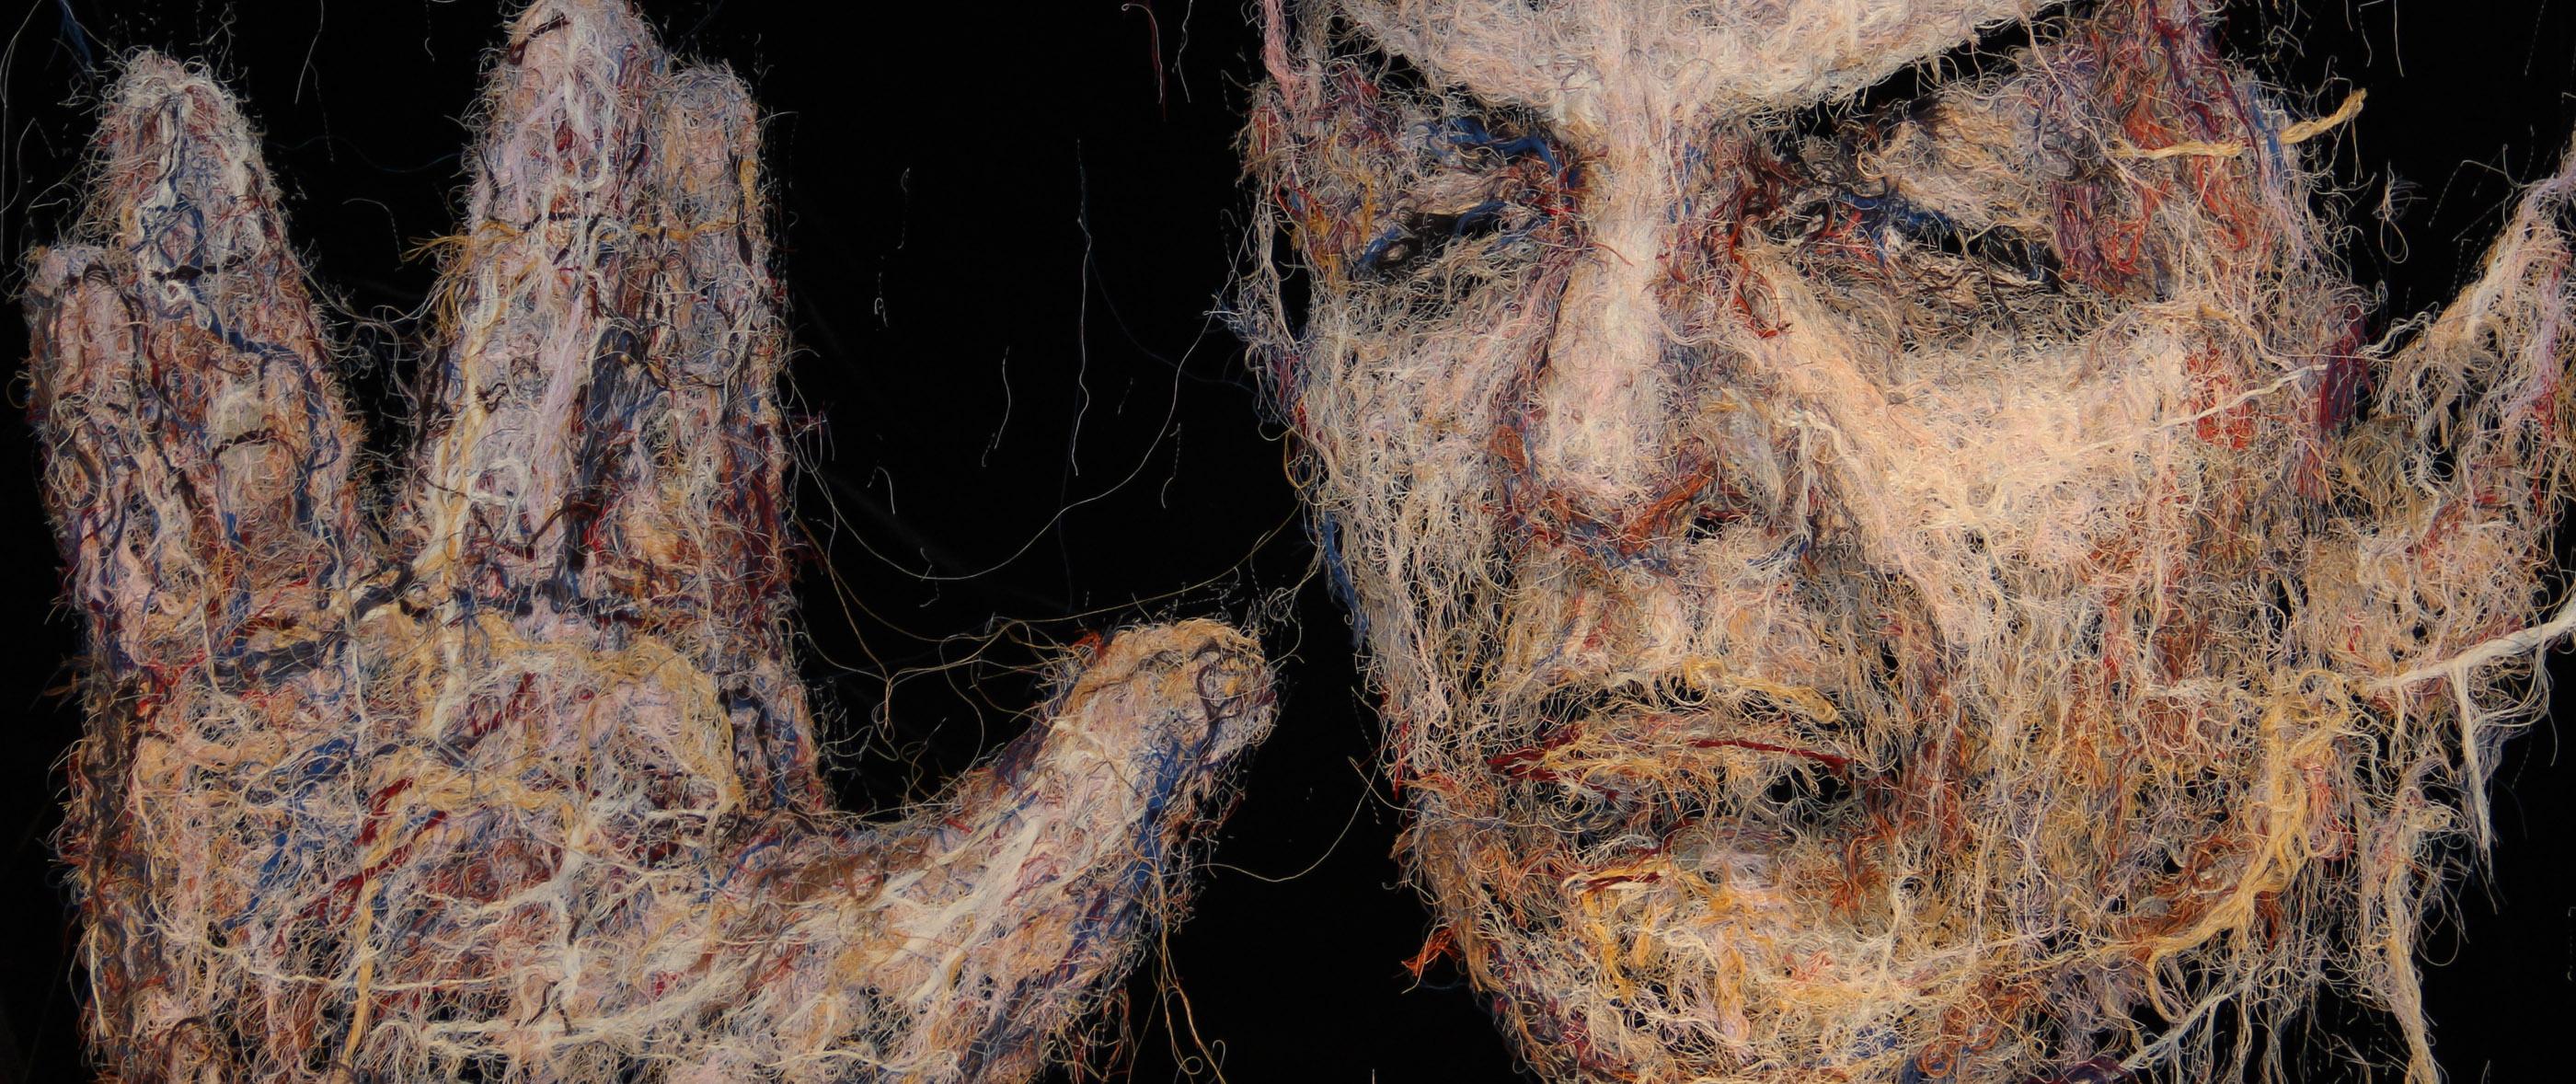 'Star Trek' Art at SDCC 2016 Celebrates 50 Years of Strange New Worlds